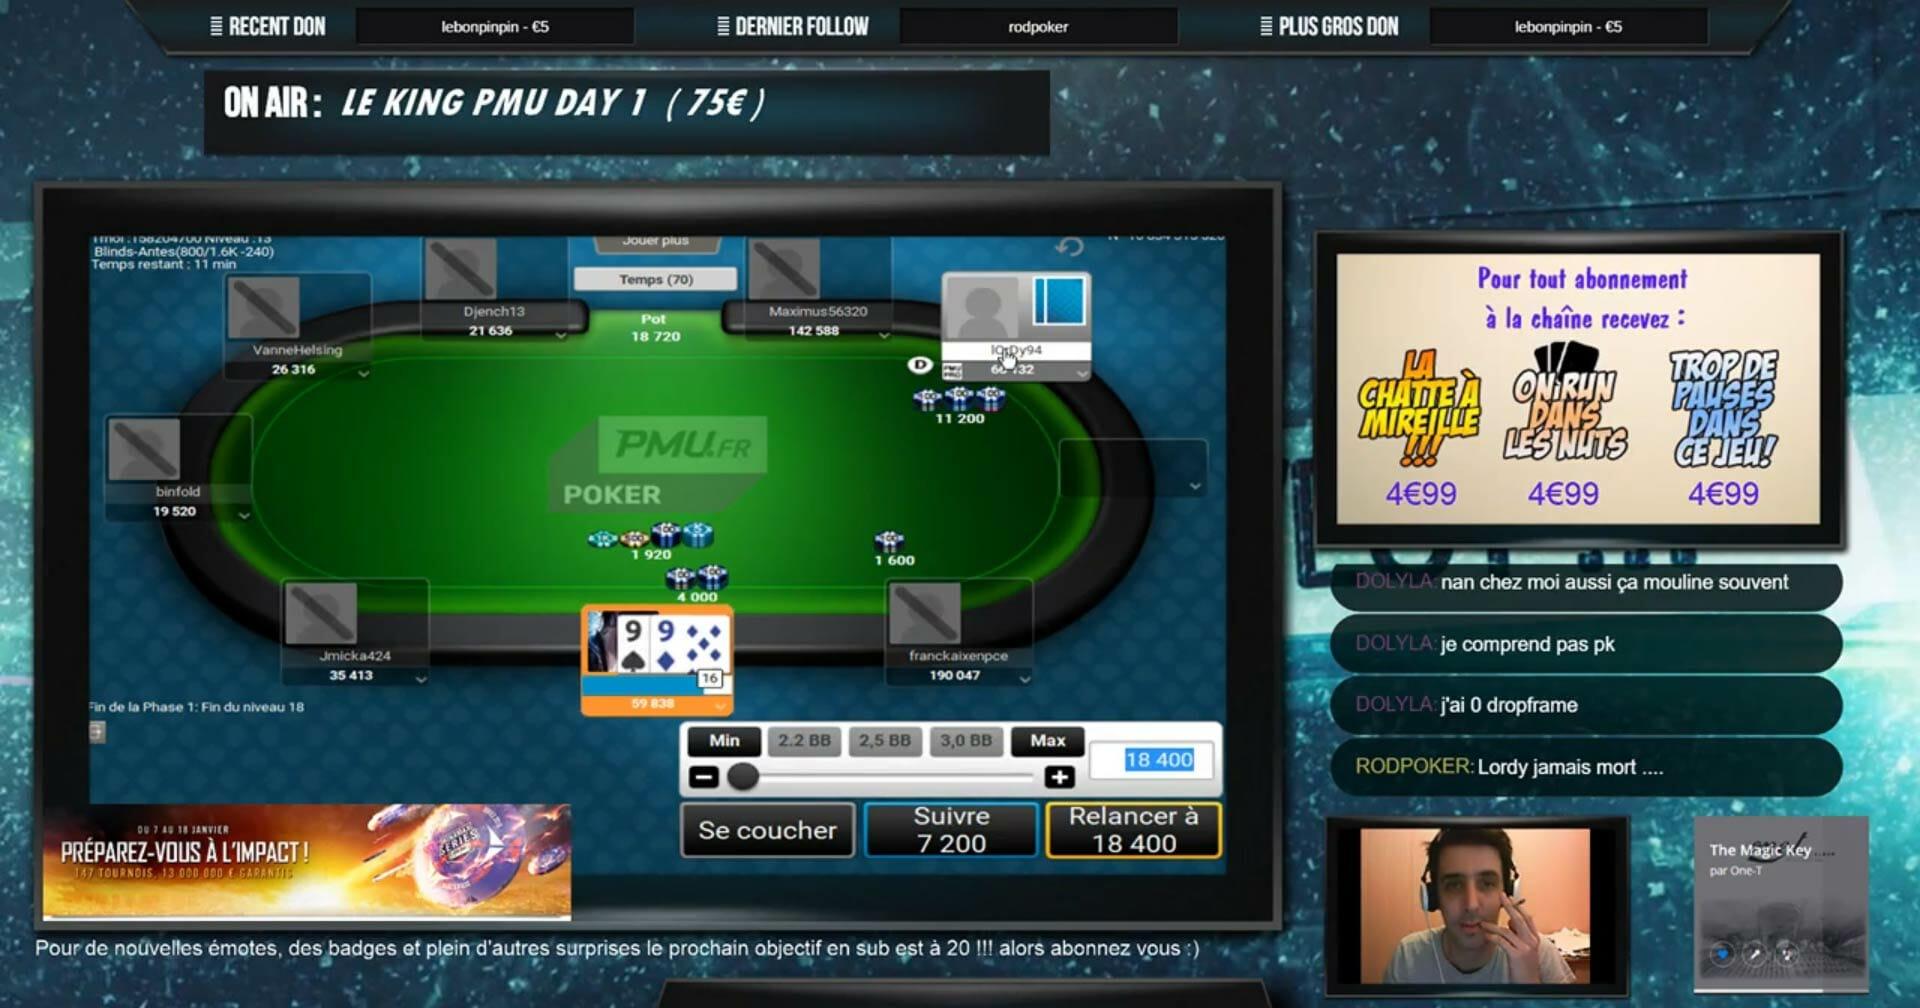 poker streamer twitch